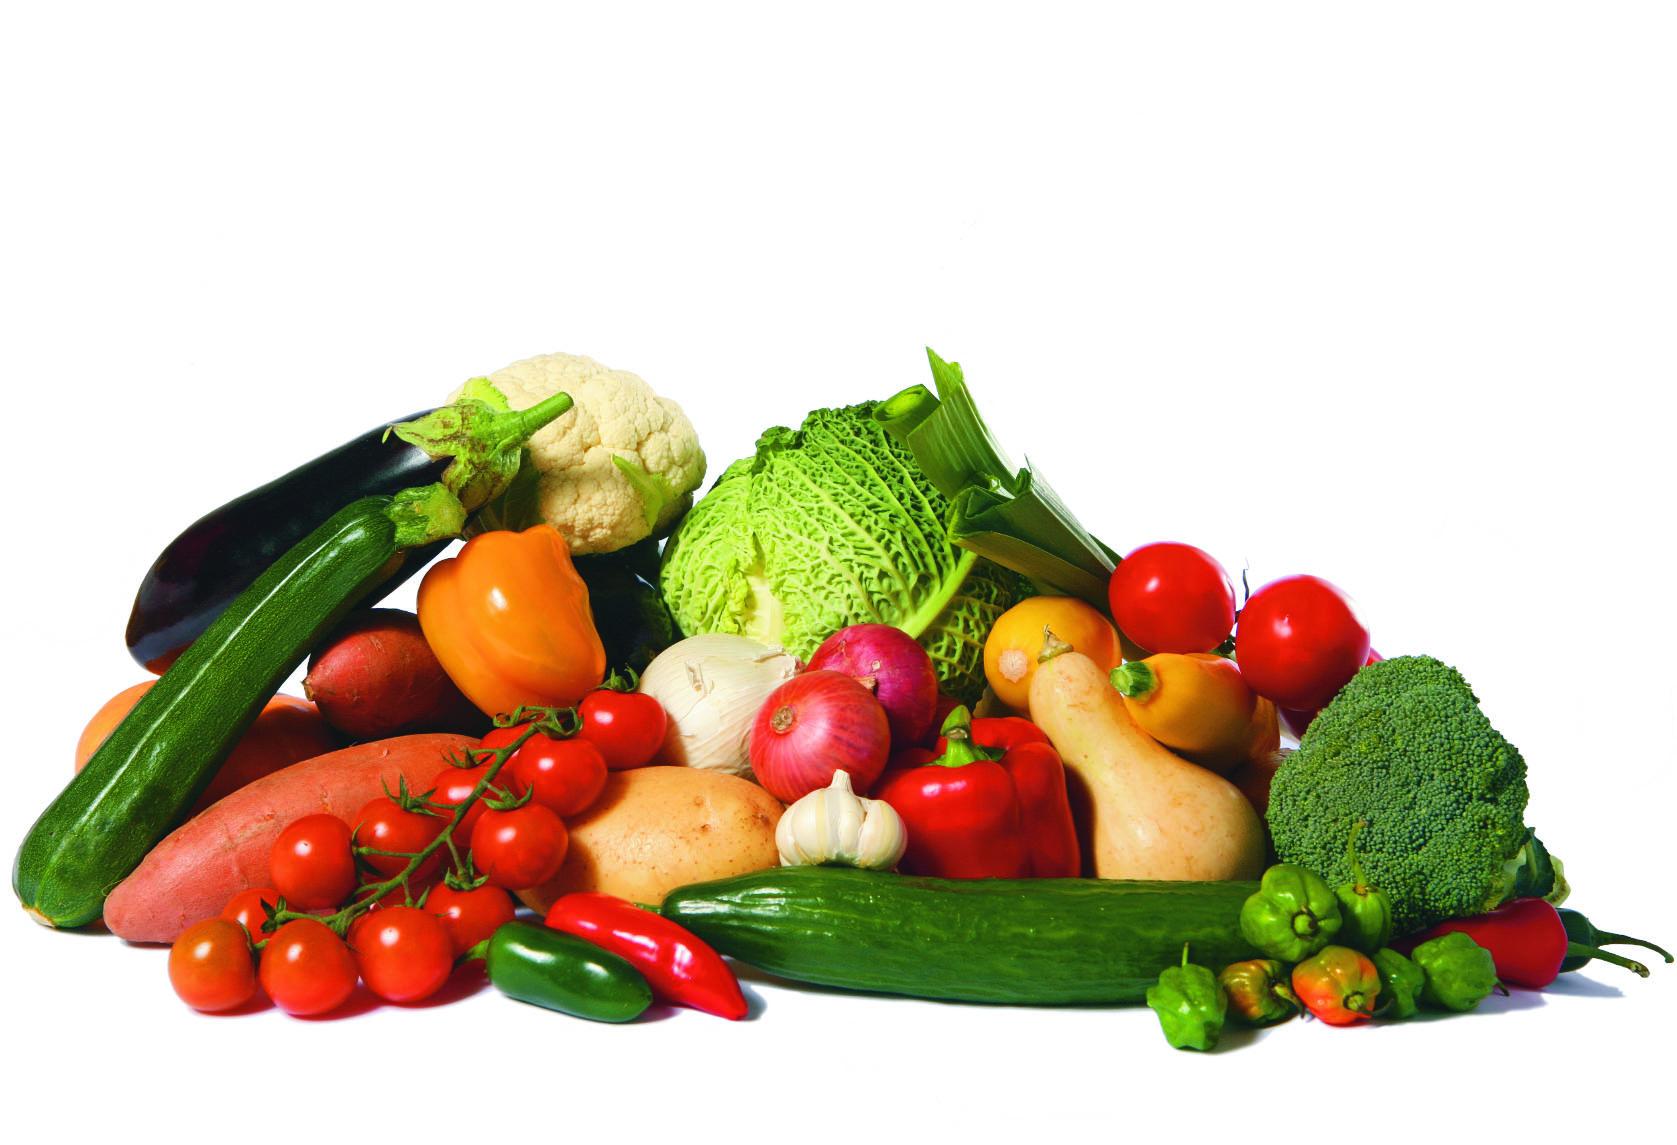 1677x1145 Nsw Healthy Food Basket Study 2007